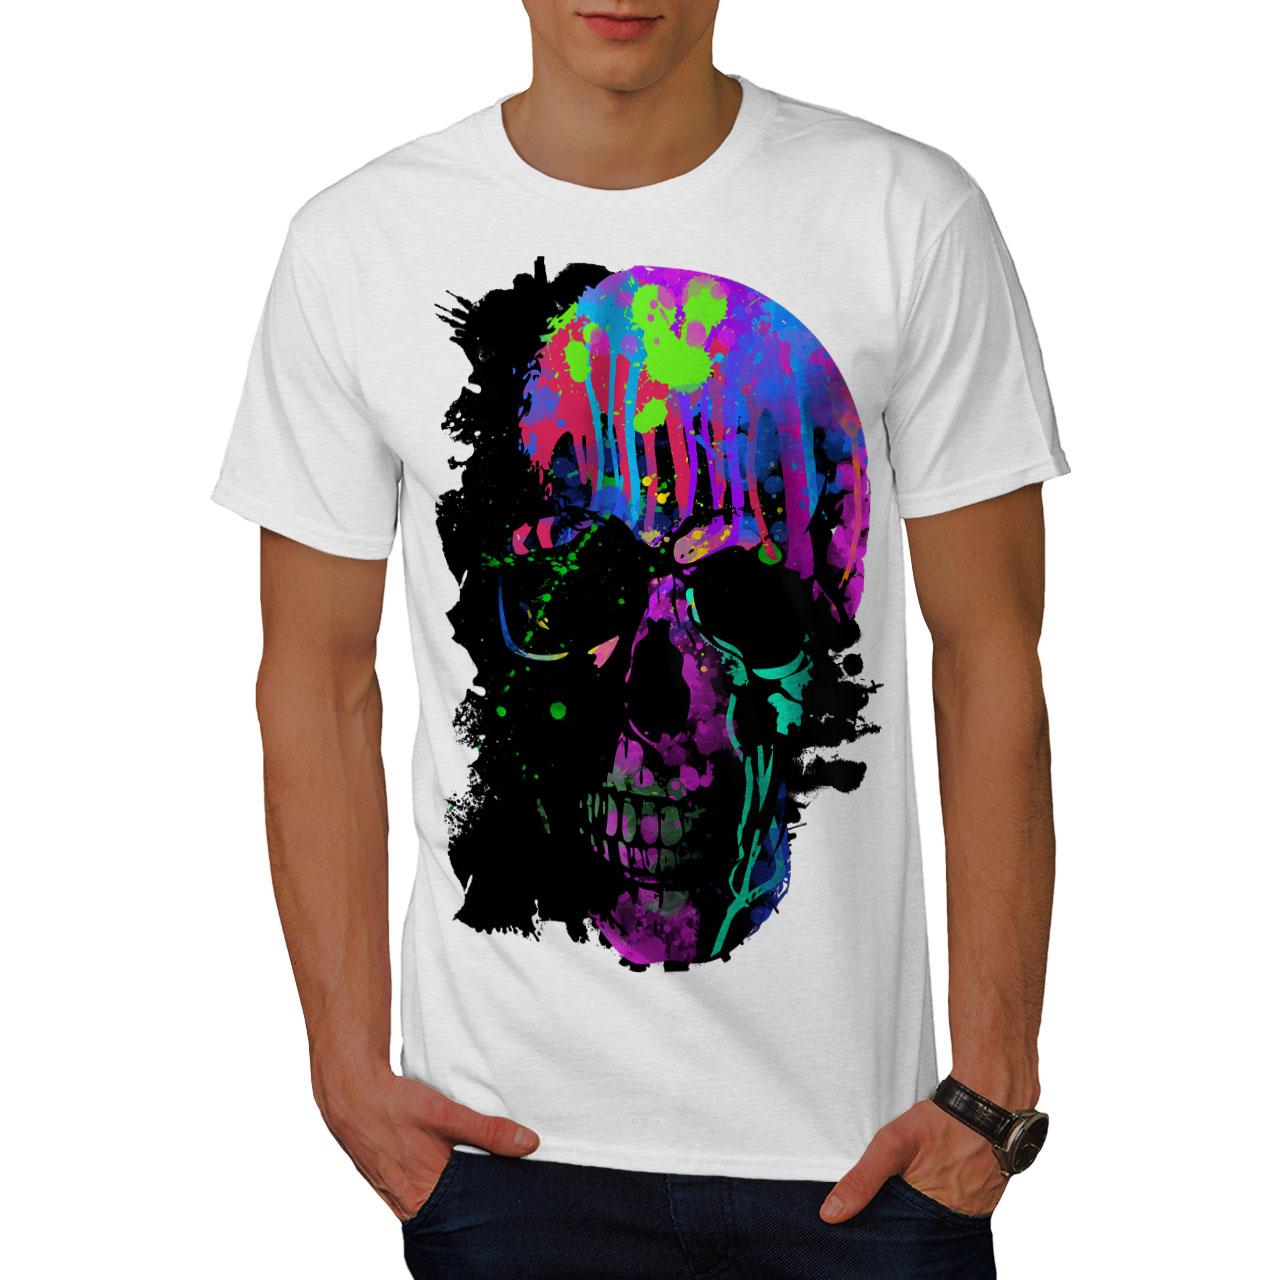 Wellcoda-Skull-Artsy-Mens-T-shirt-Neon-Night-Graphic-Design-Printed-Tee thumbnail 9